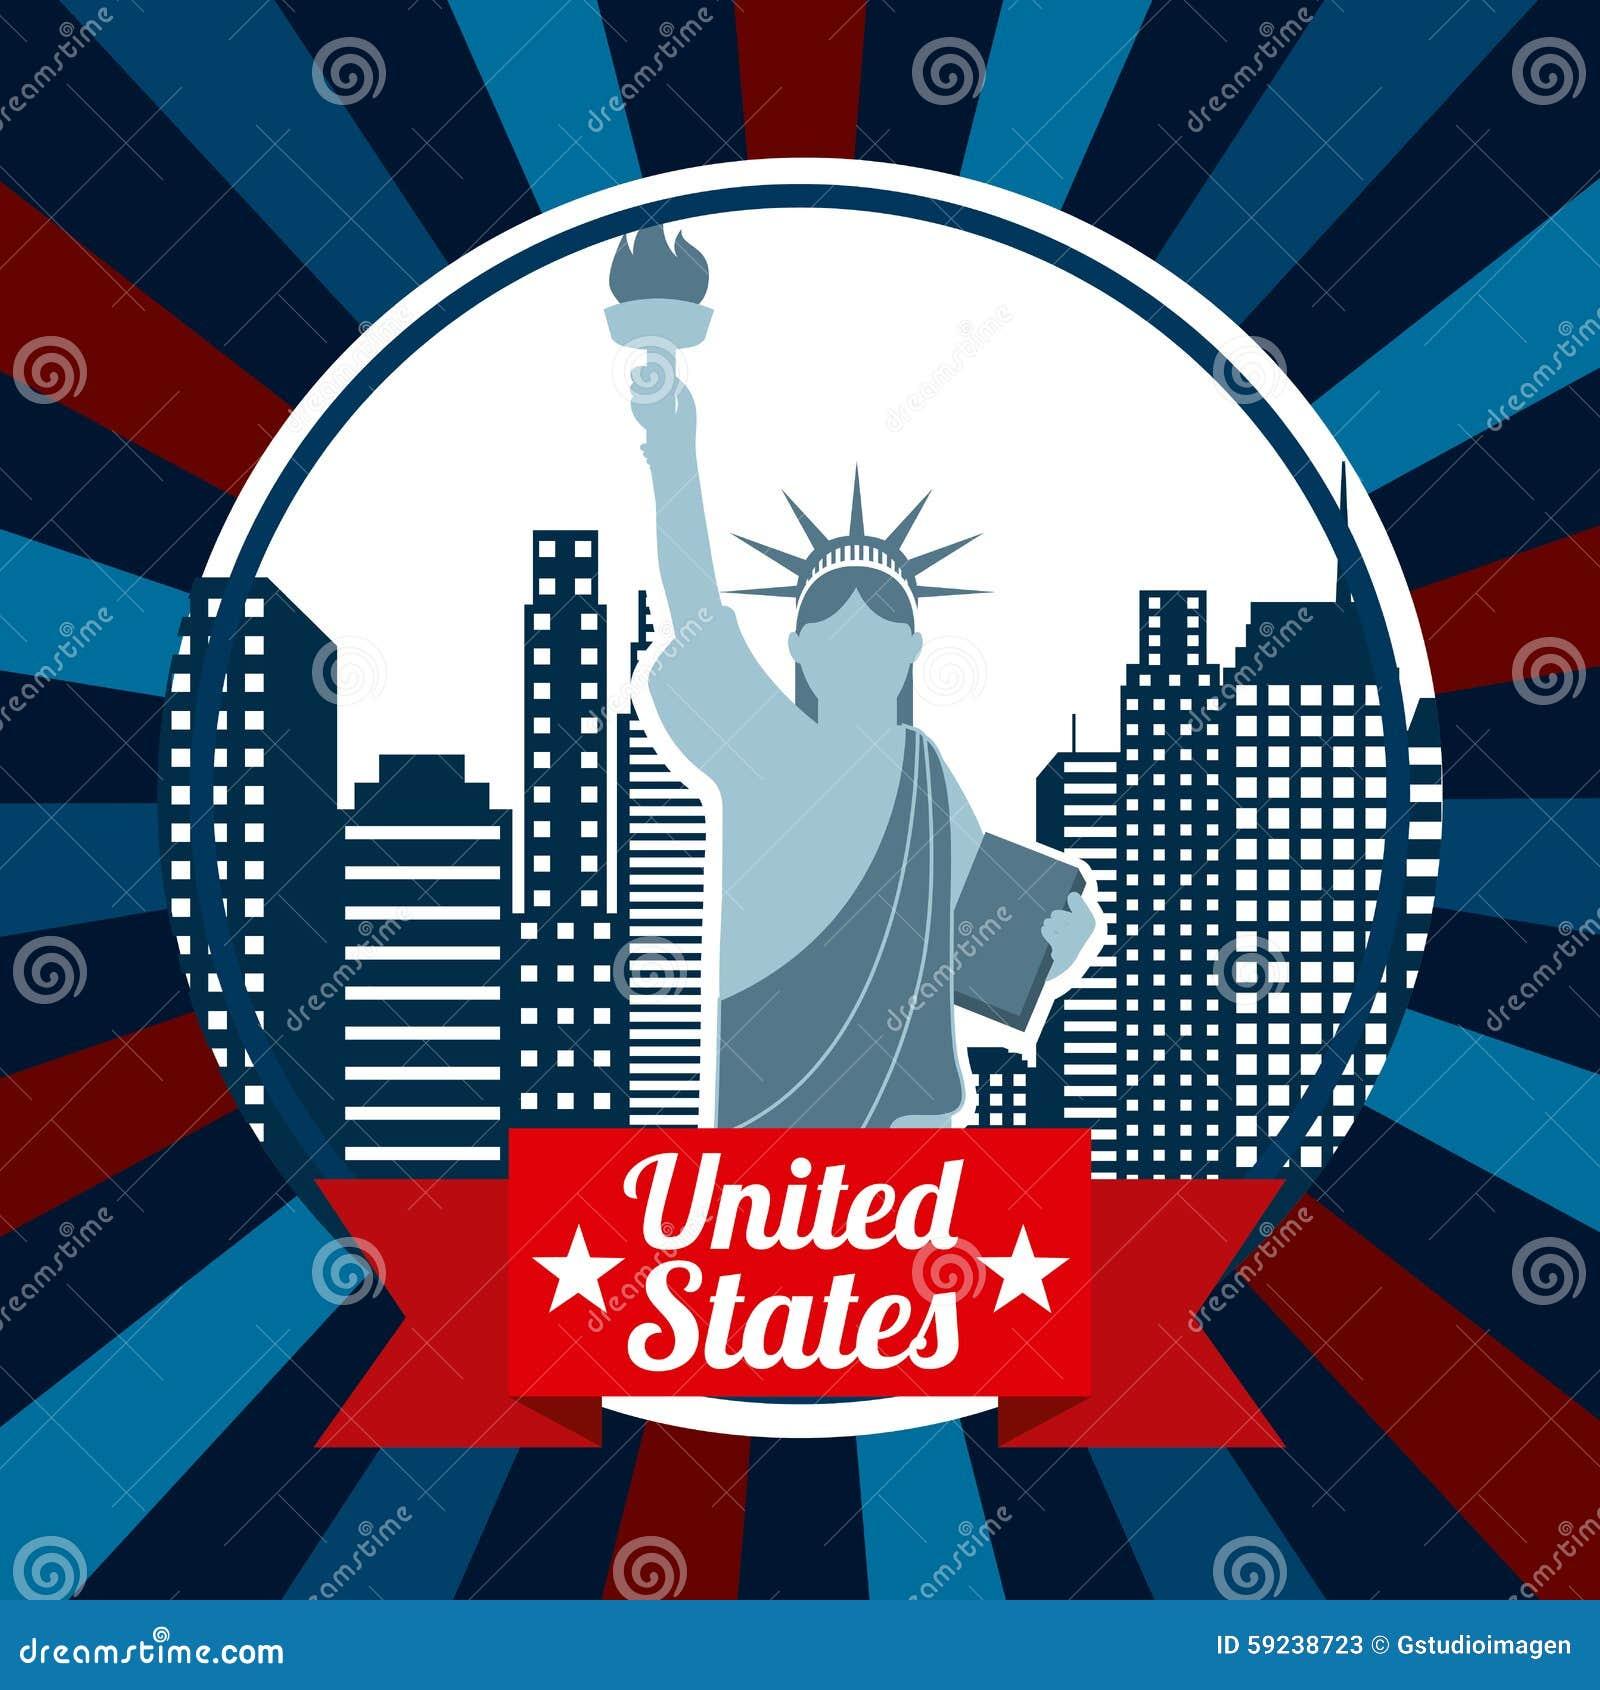 Estados Unidos simbolizan